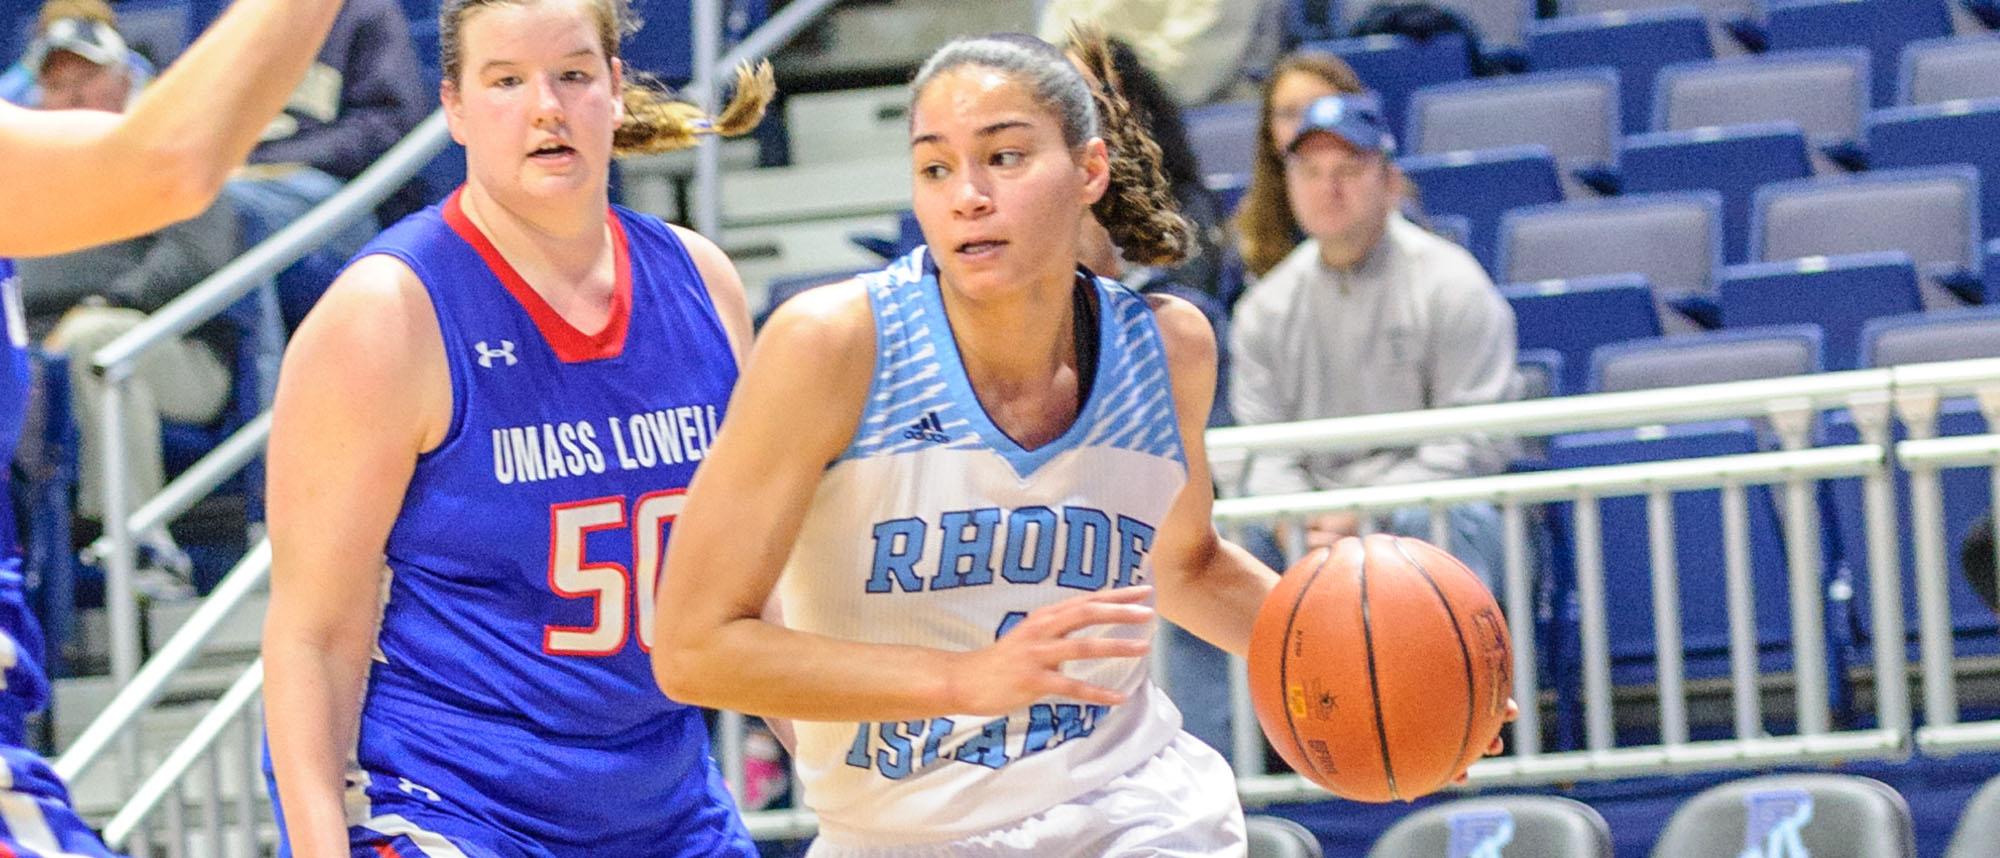 Tayra Melendez named Bryant University Director of Basketball Operations - Women's Hoop Dirt